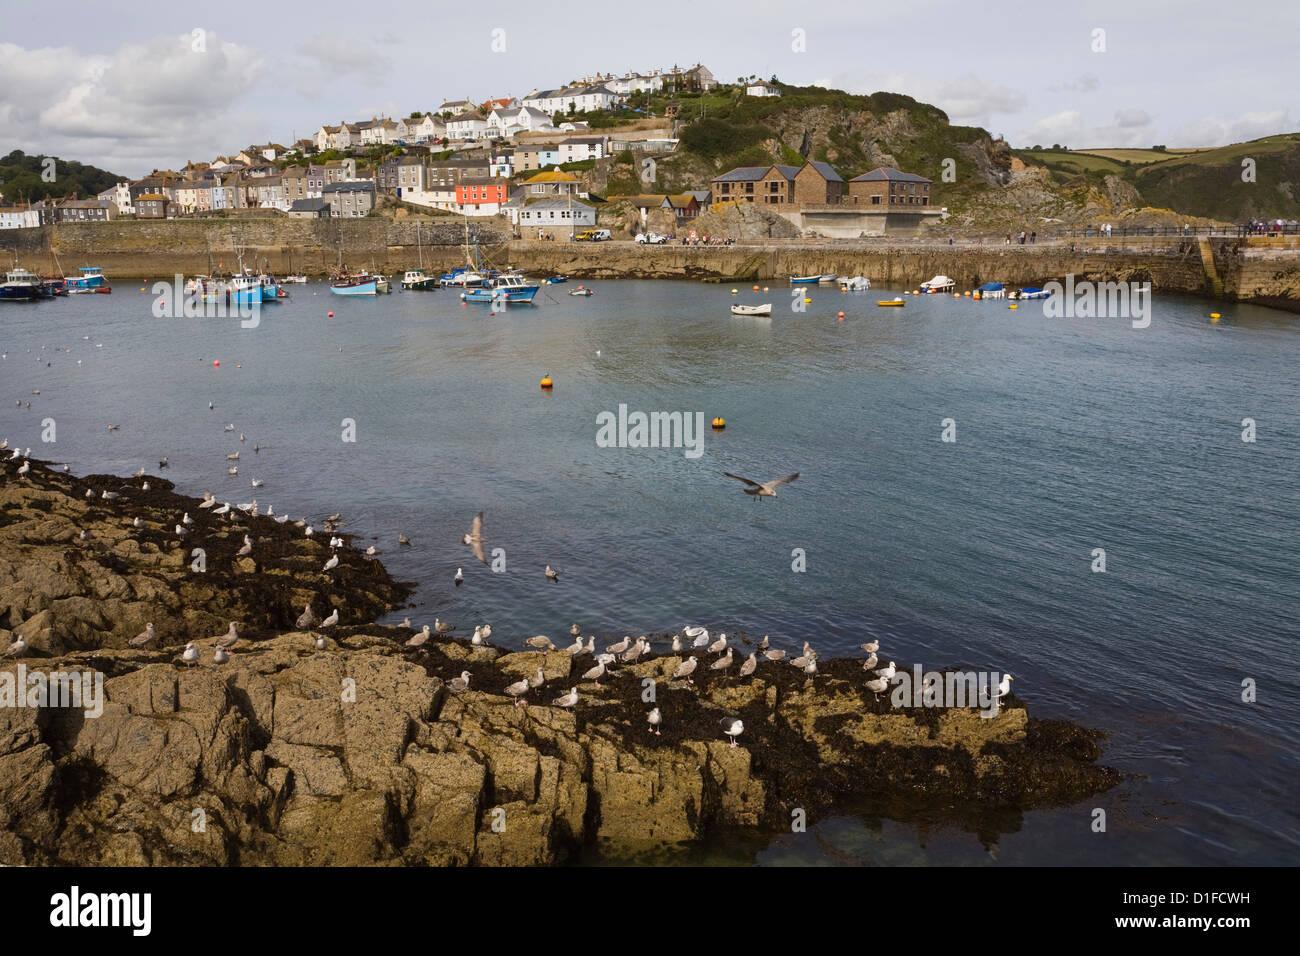 Saint Austell United Kingdom  City new picture : ... Mevagissey, St. Austell, Cornwall, England, United Kingdom, Europe